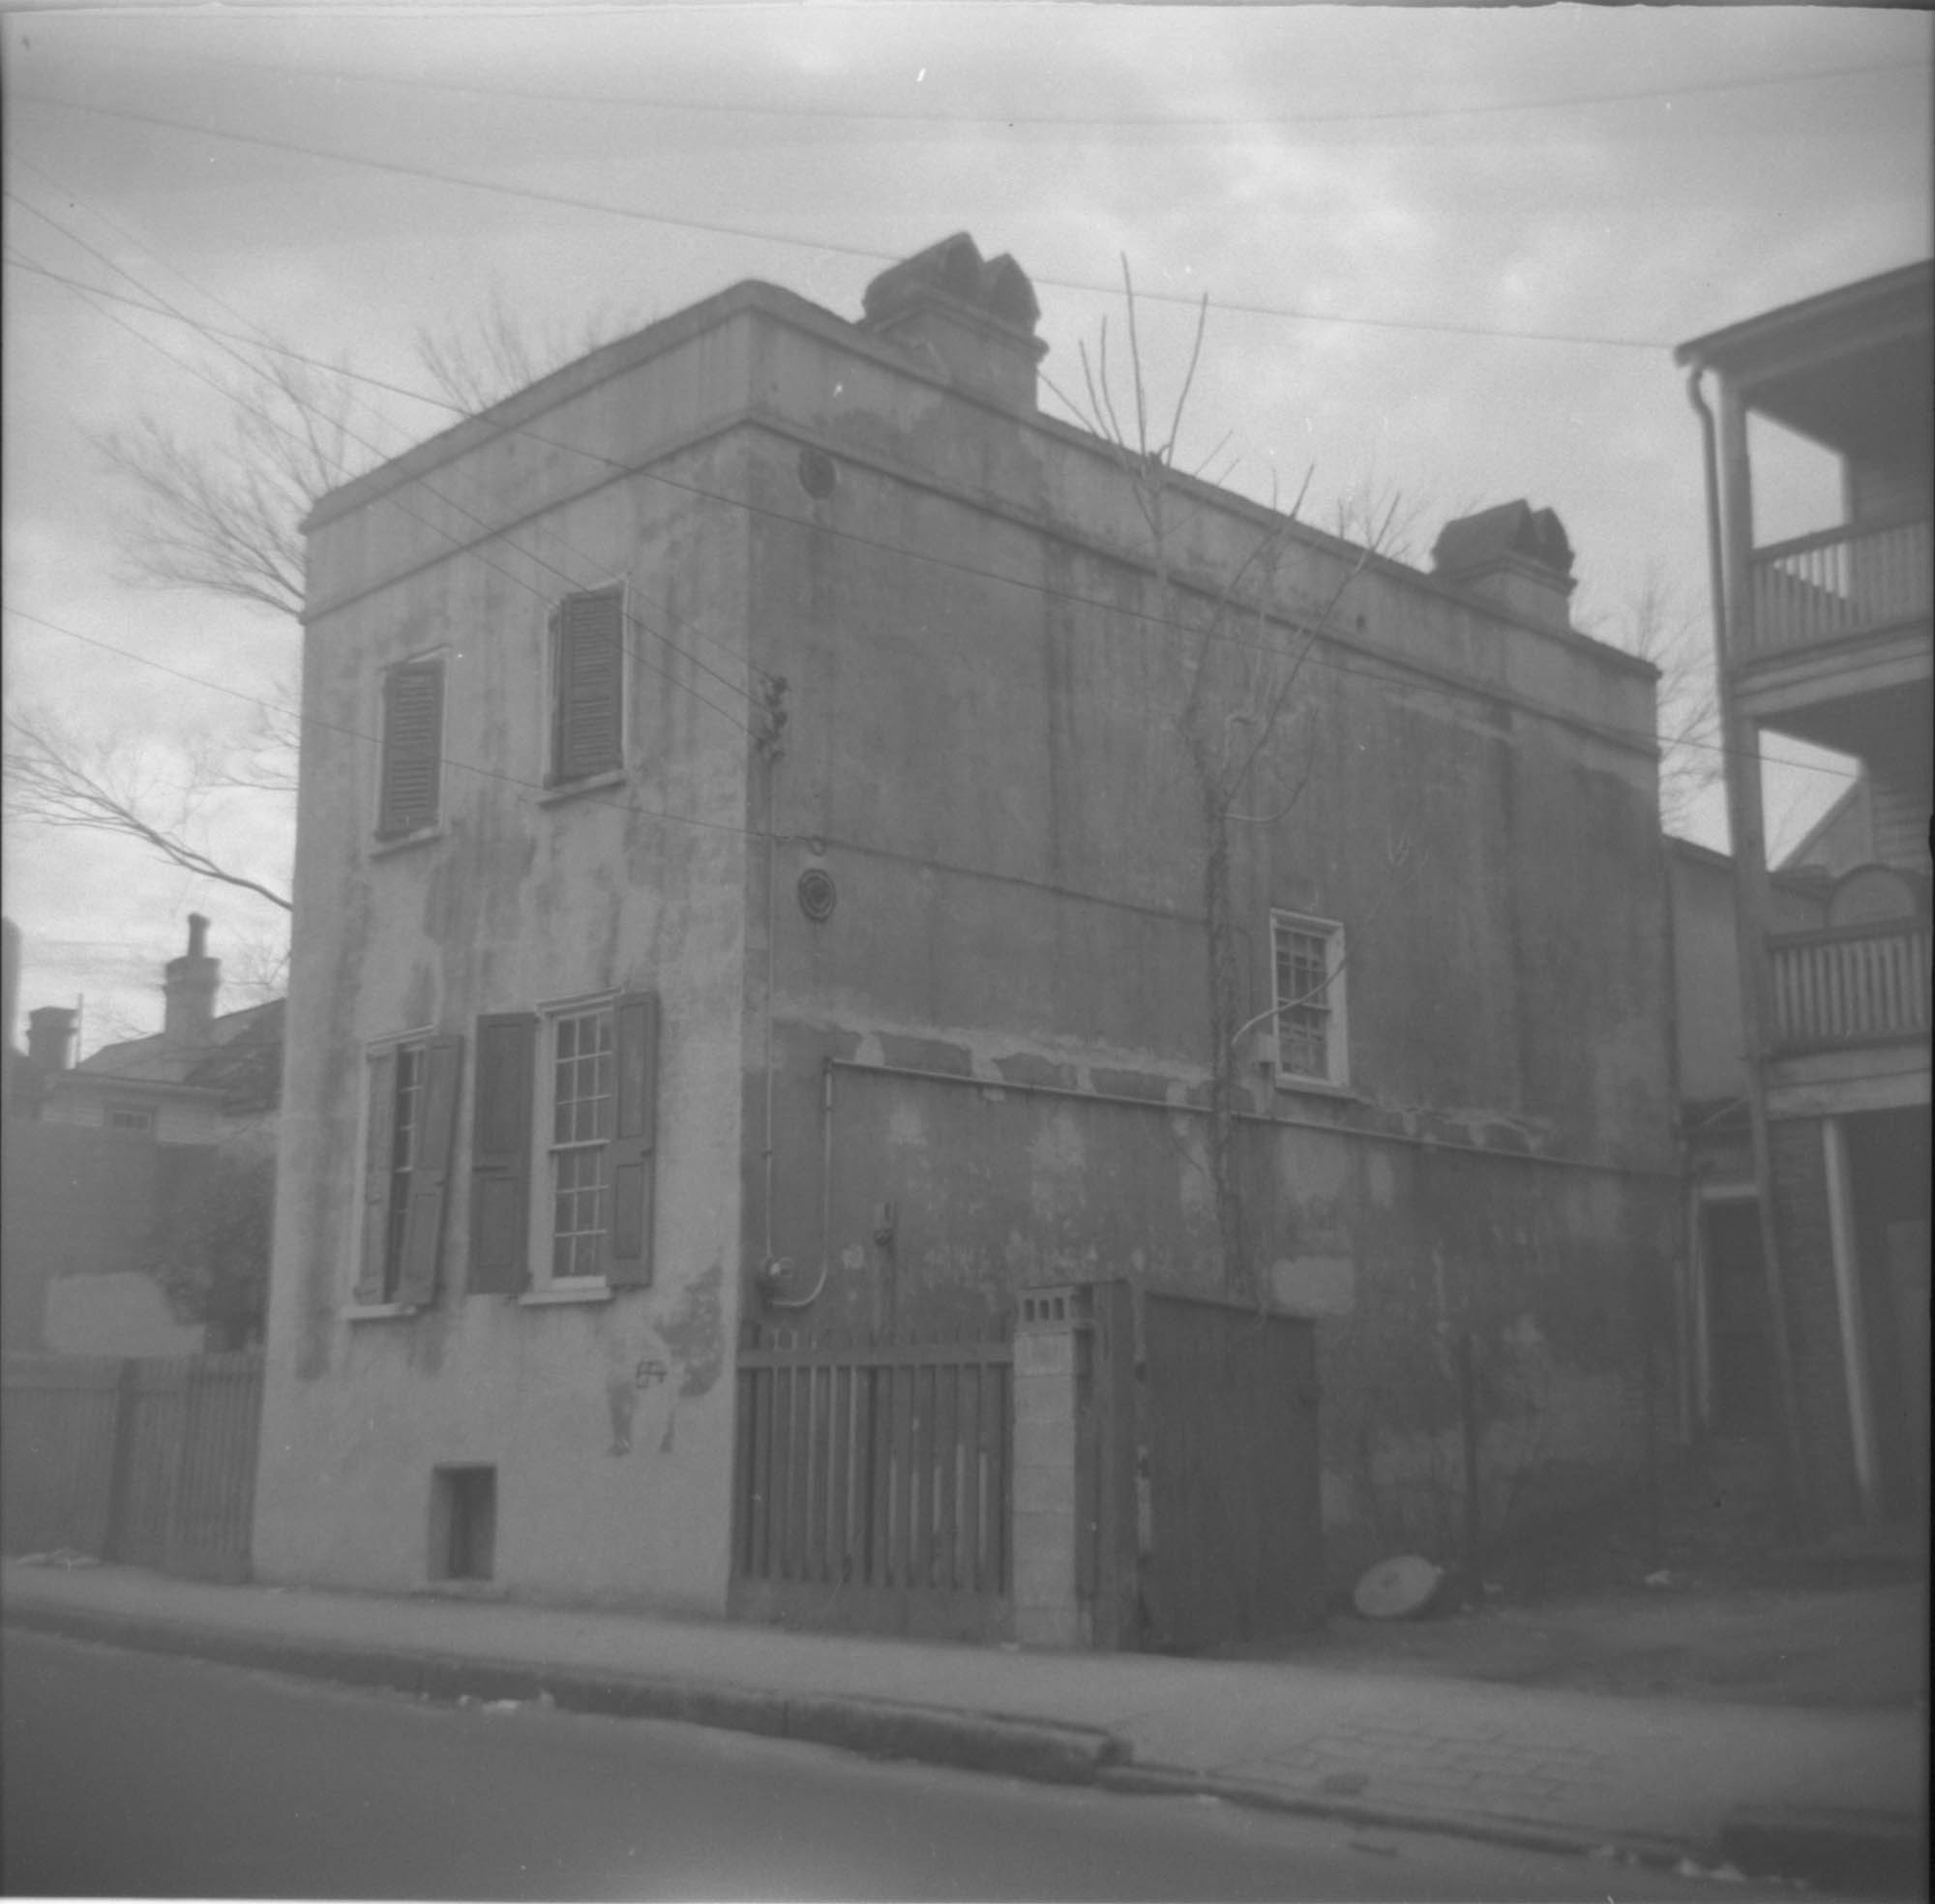 57 Anson Street